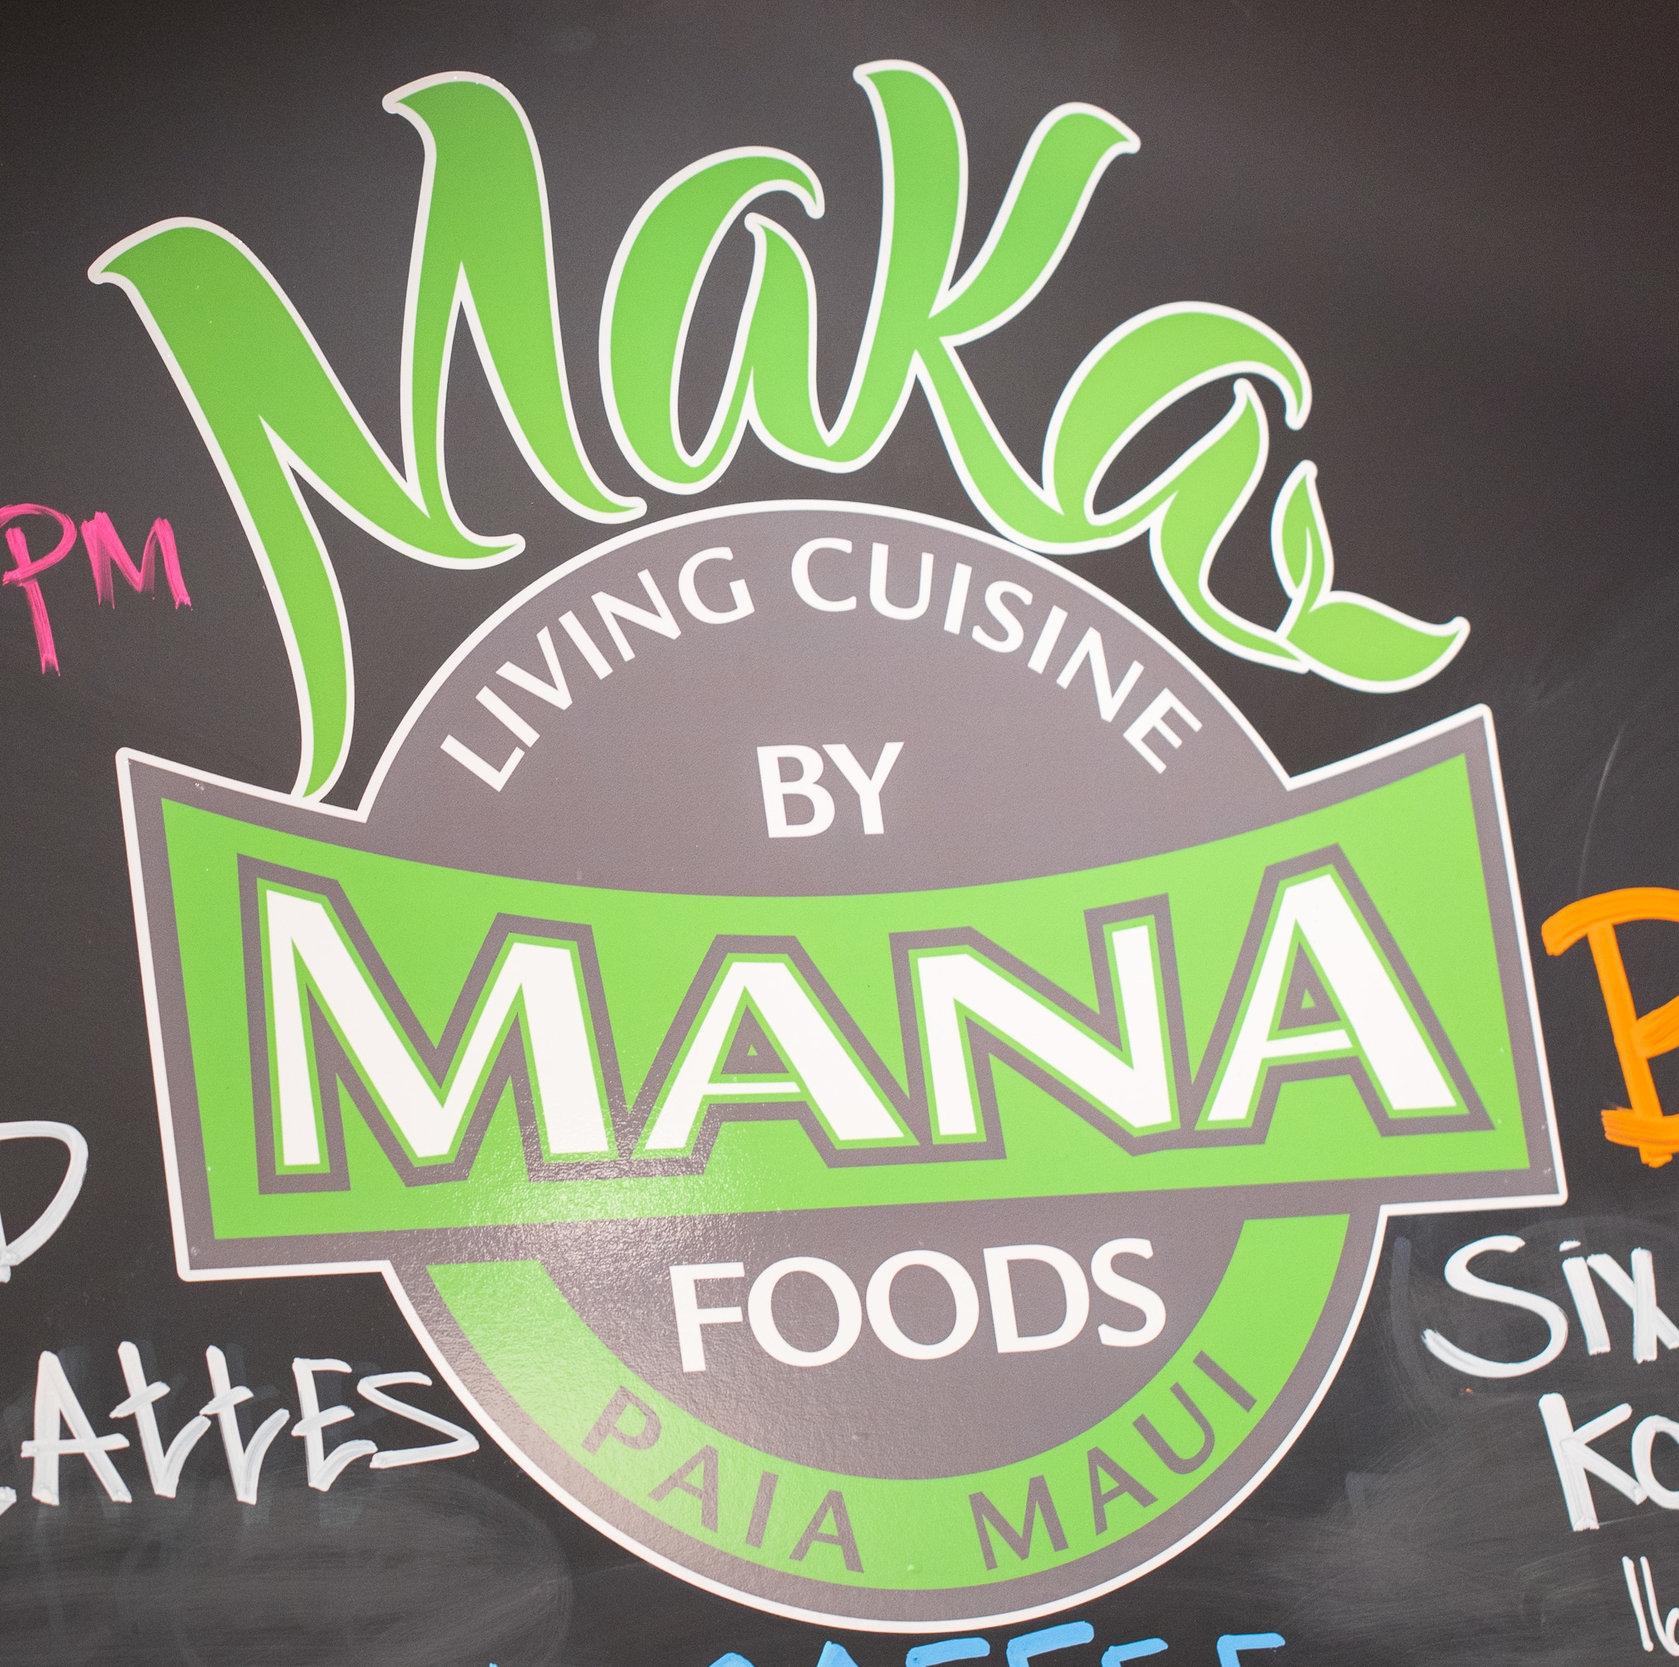 maka-menu-vegan-gluten-free-cafe-maui-4.jpg